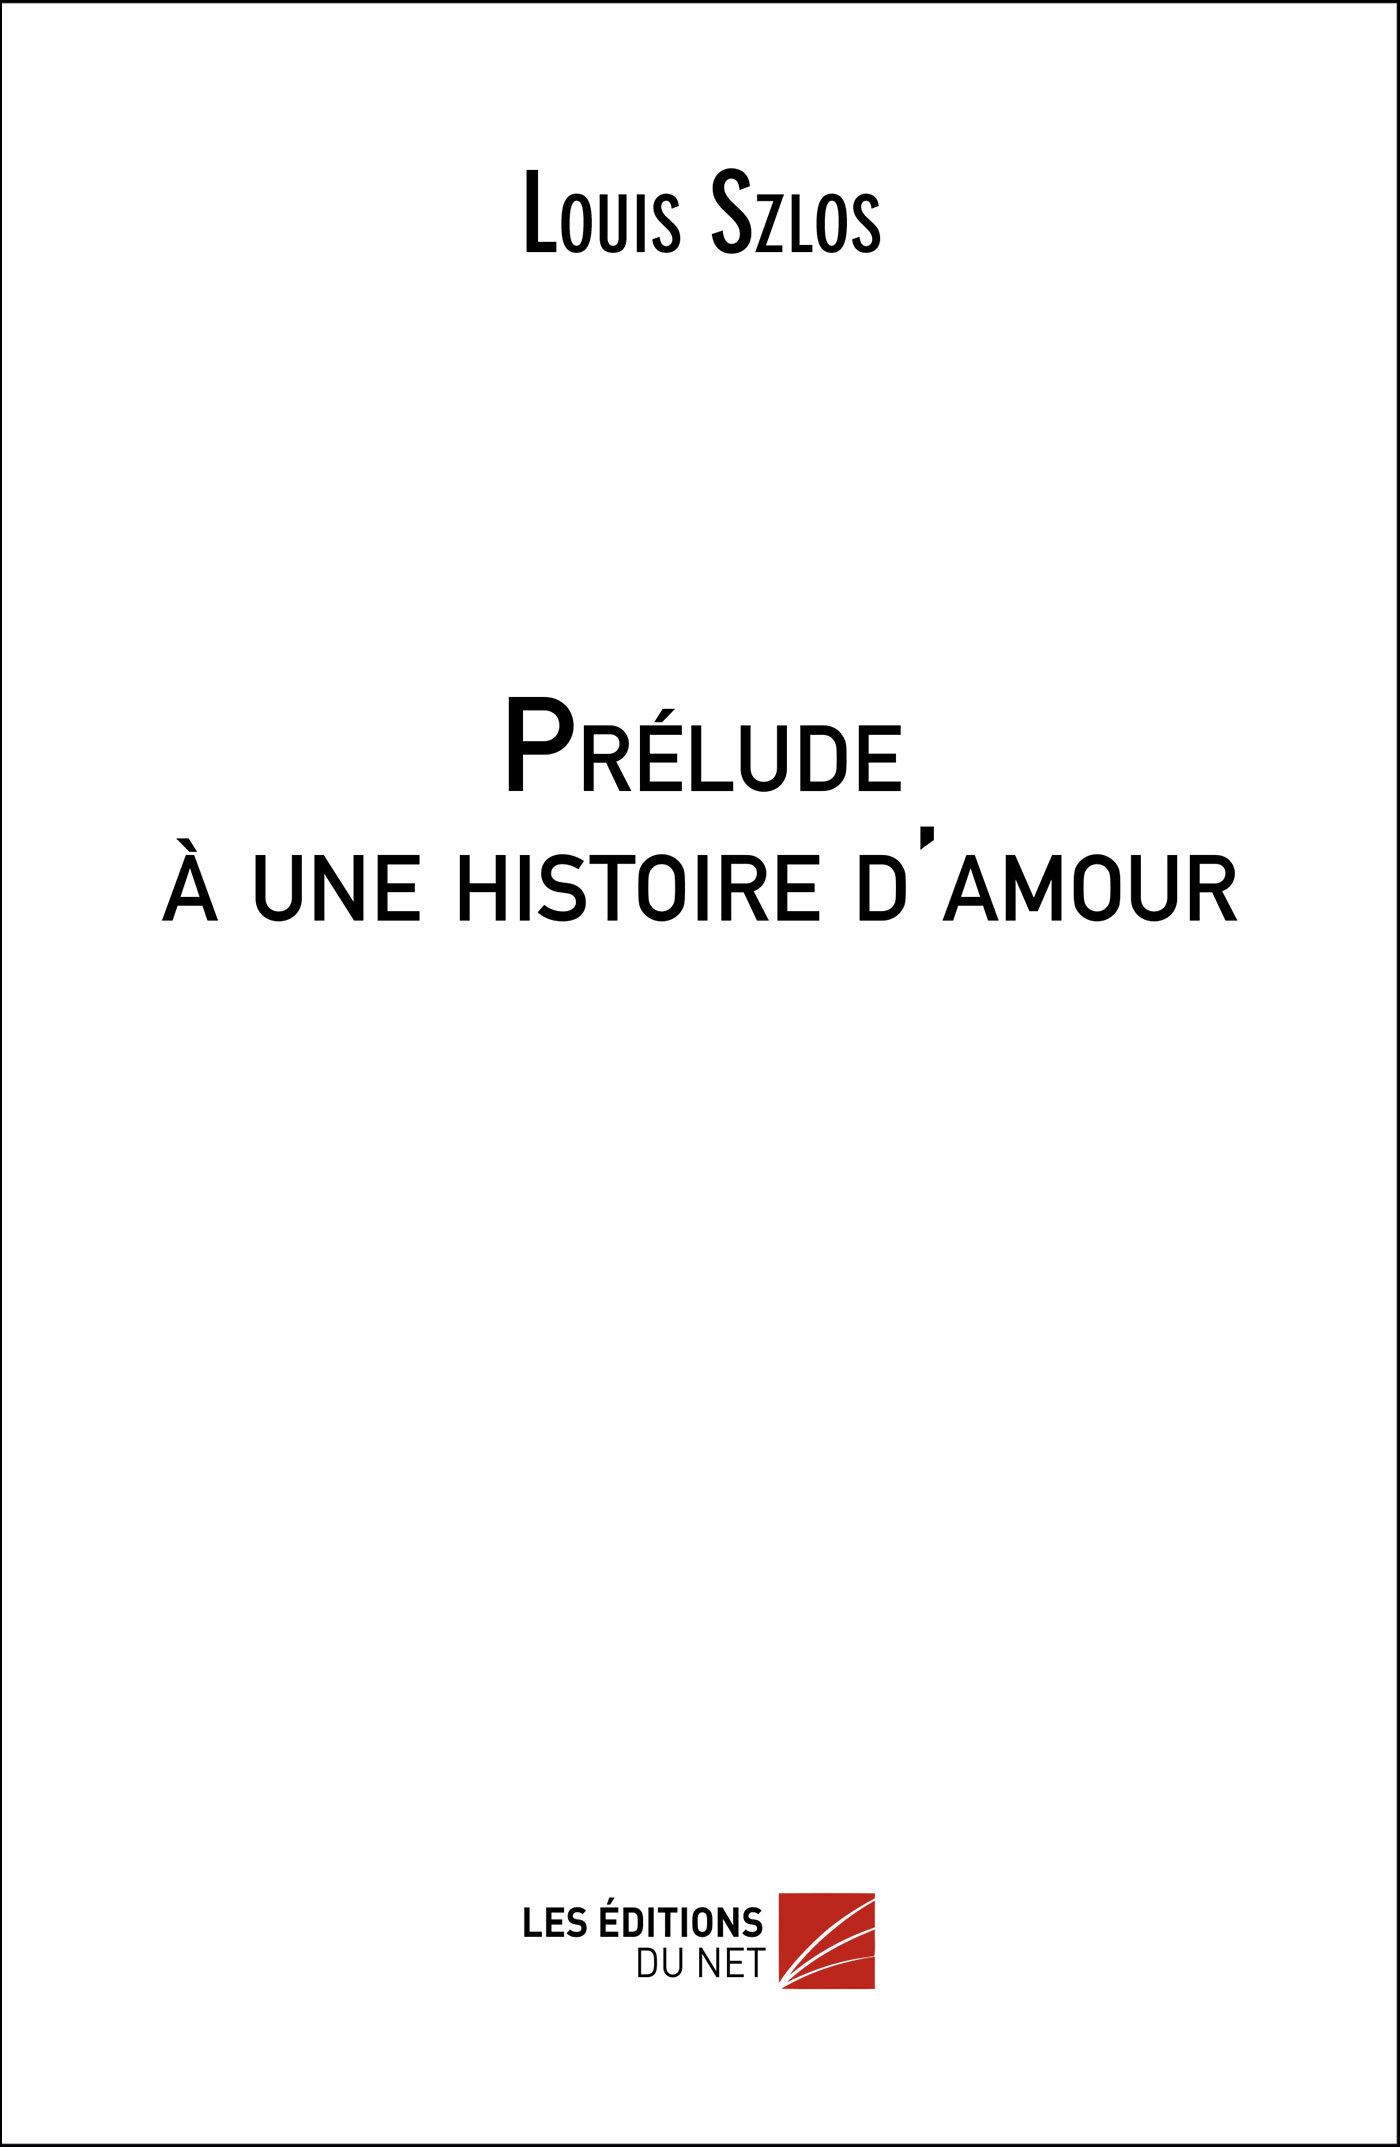 PRELUDE A UNE HISTOIRE D'AMOUR